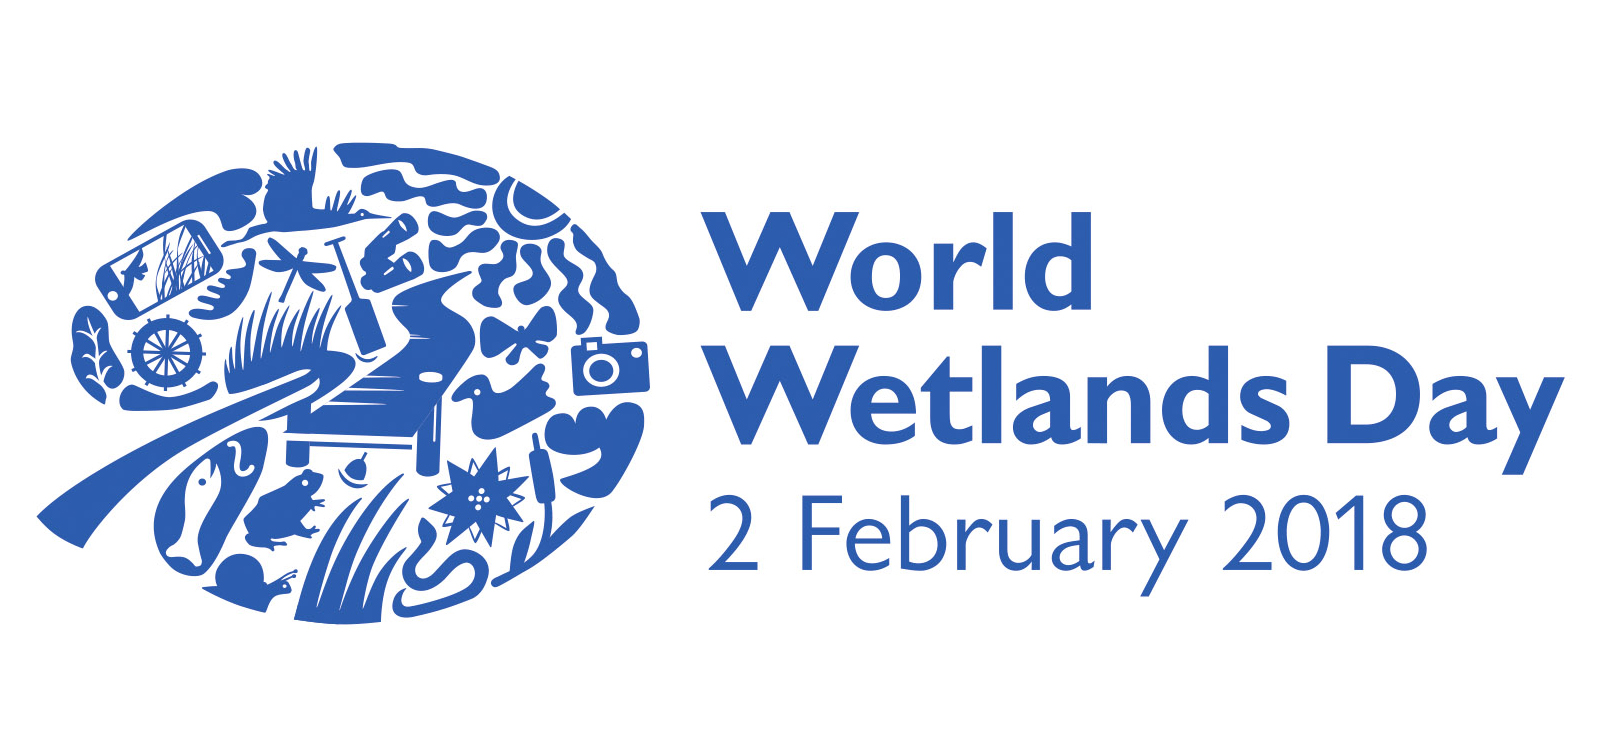 World Wetlands Day, 2 February 2018.